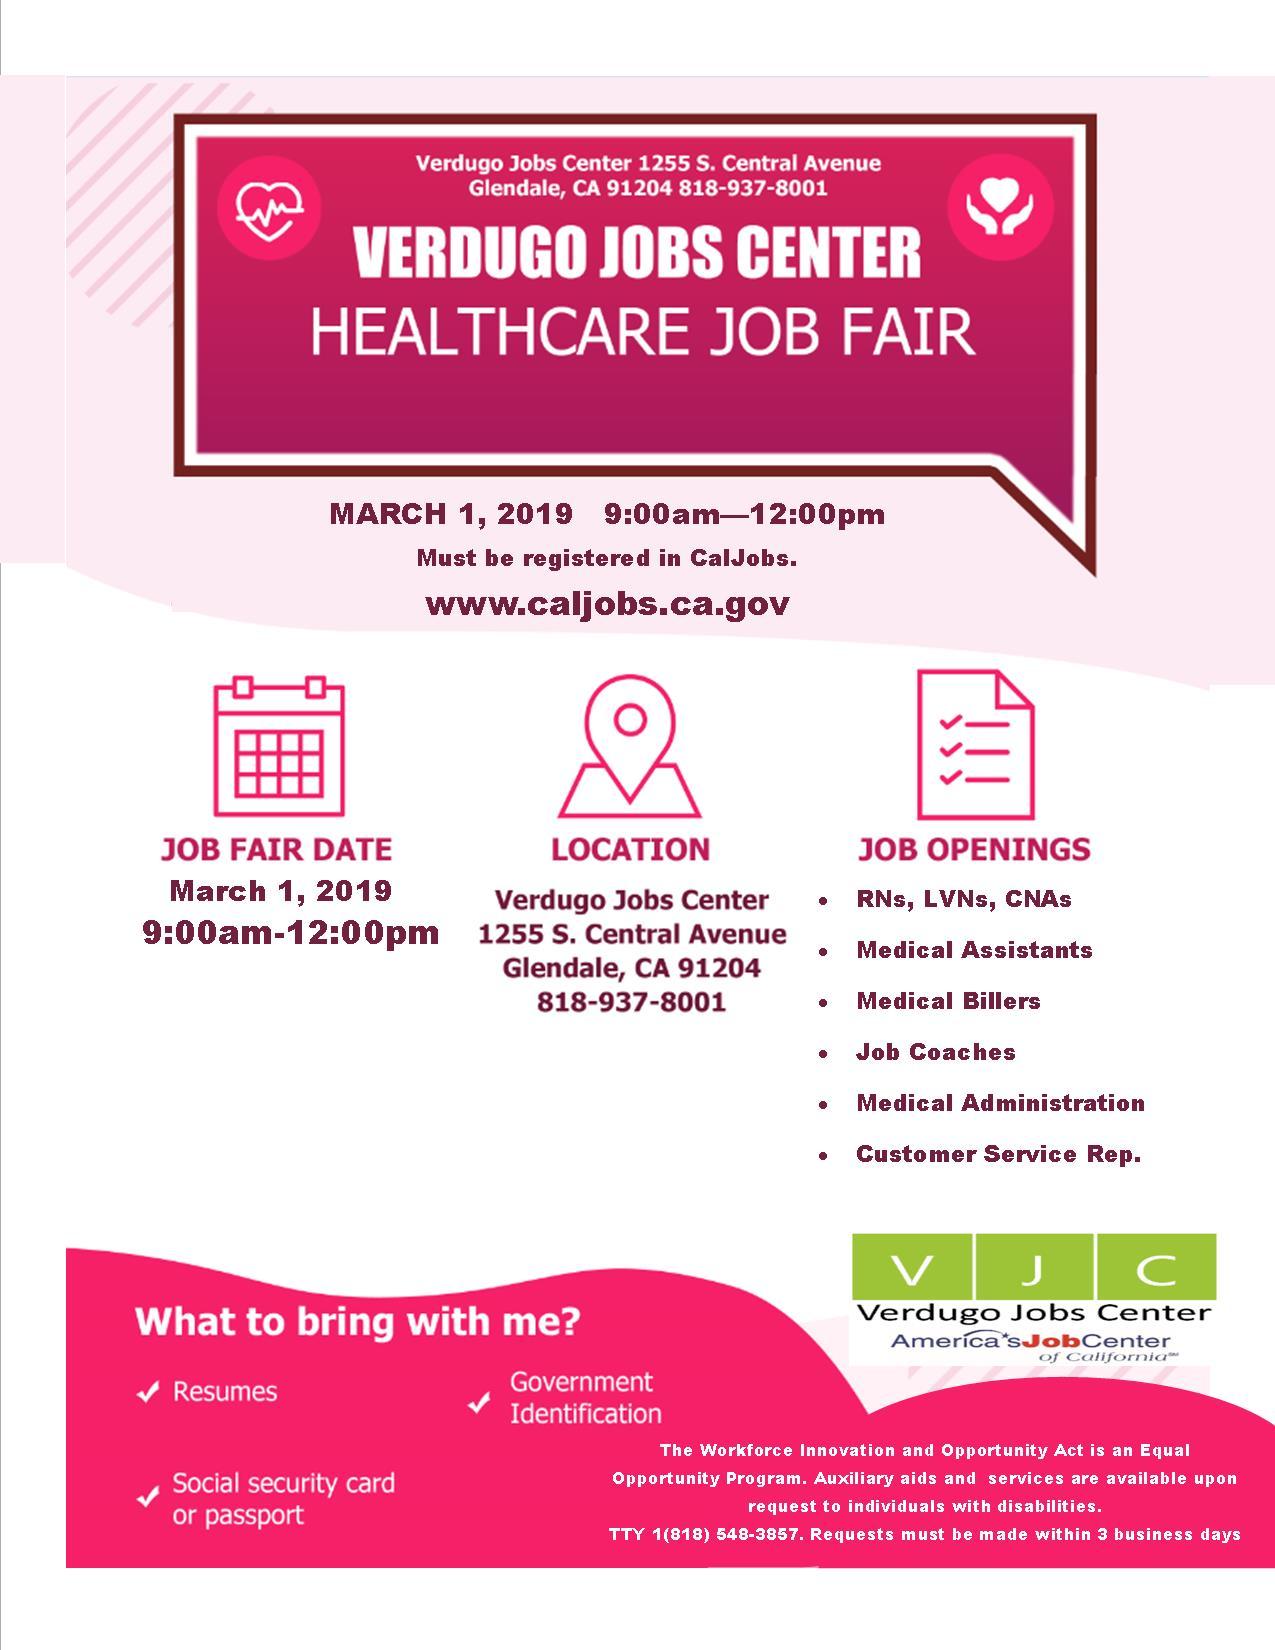 Verdugo Jobs Center